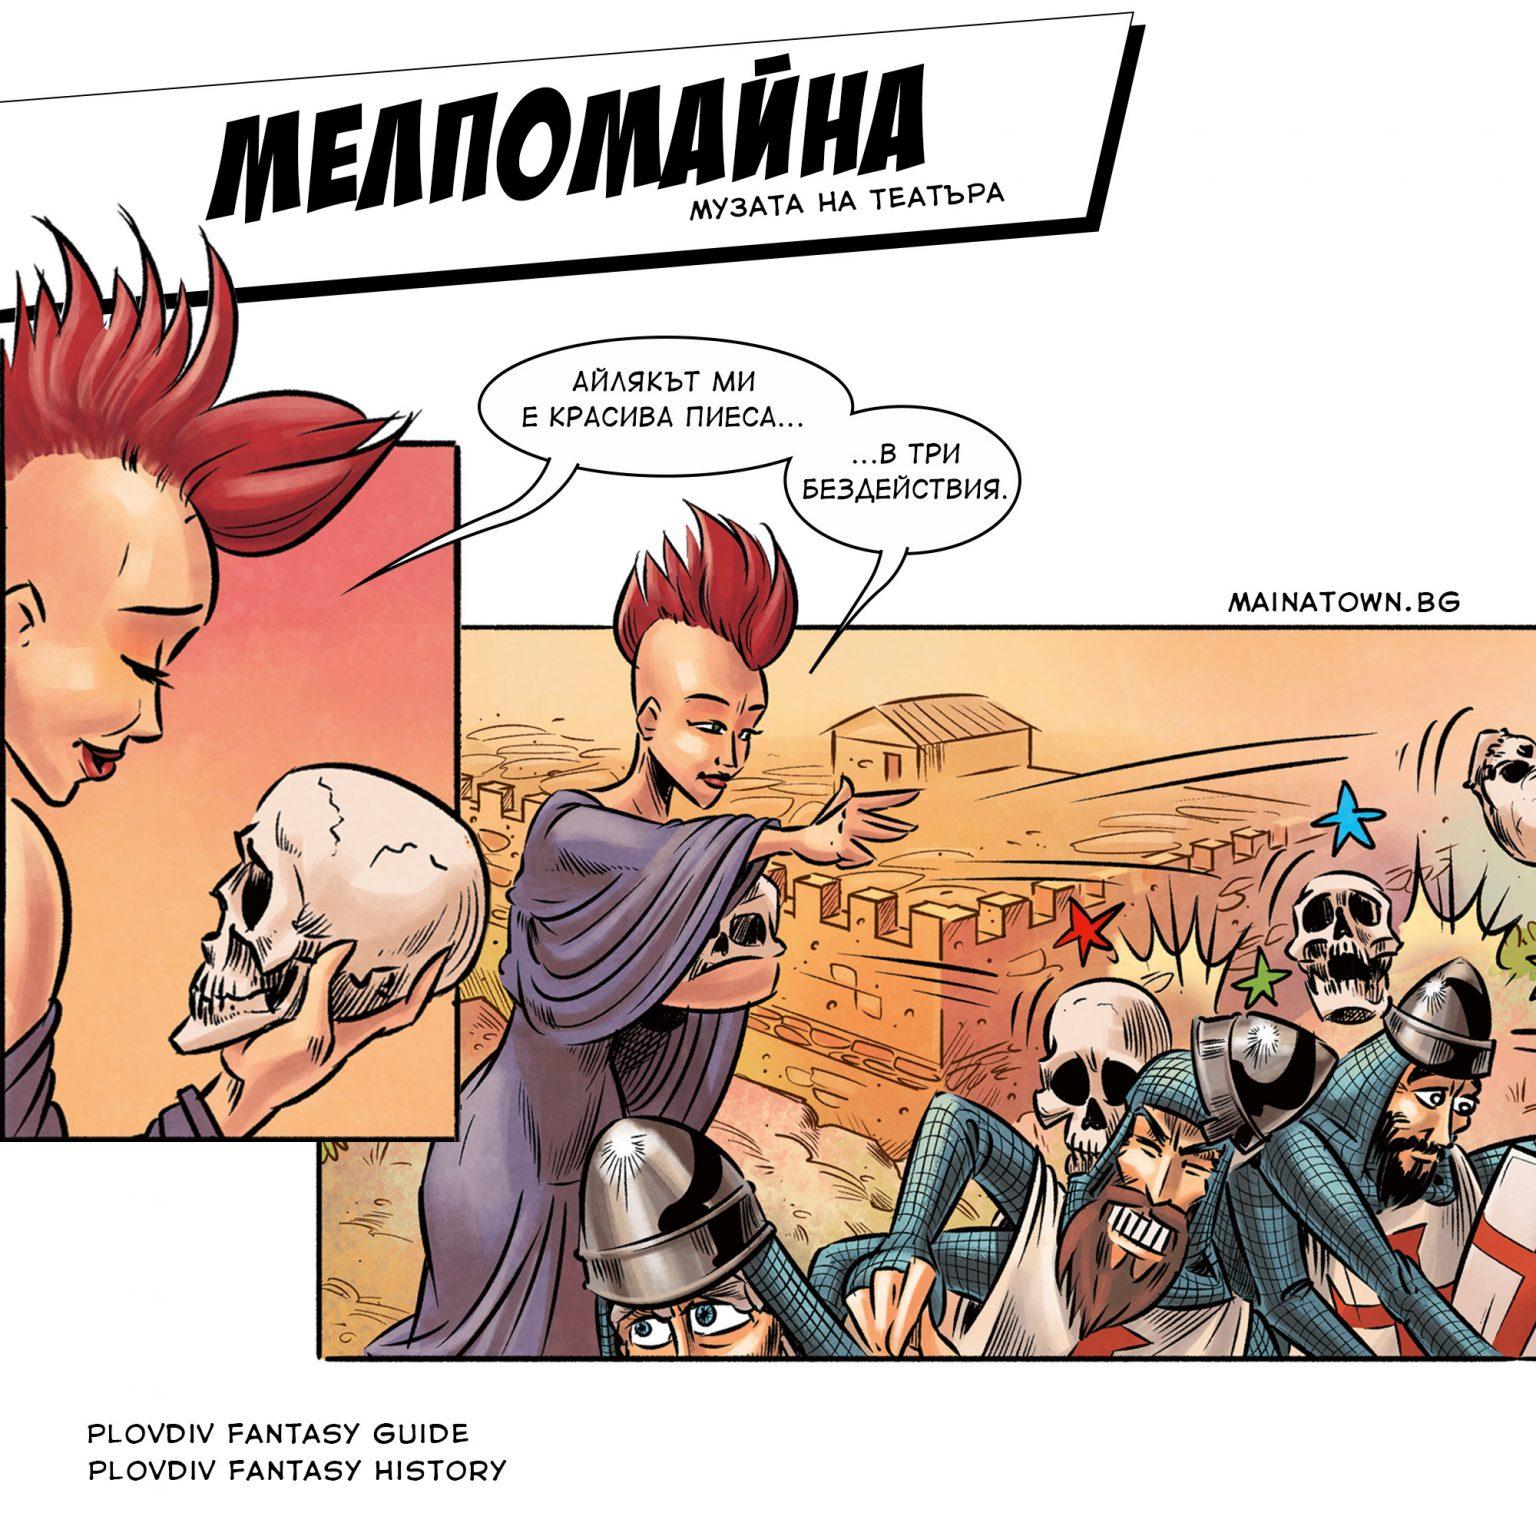 Melpomaina